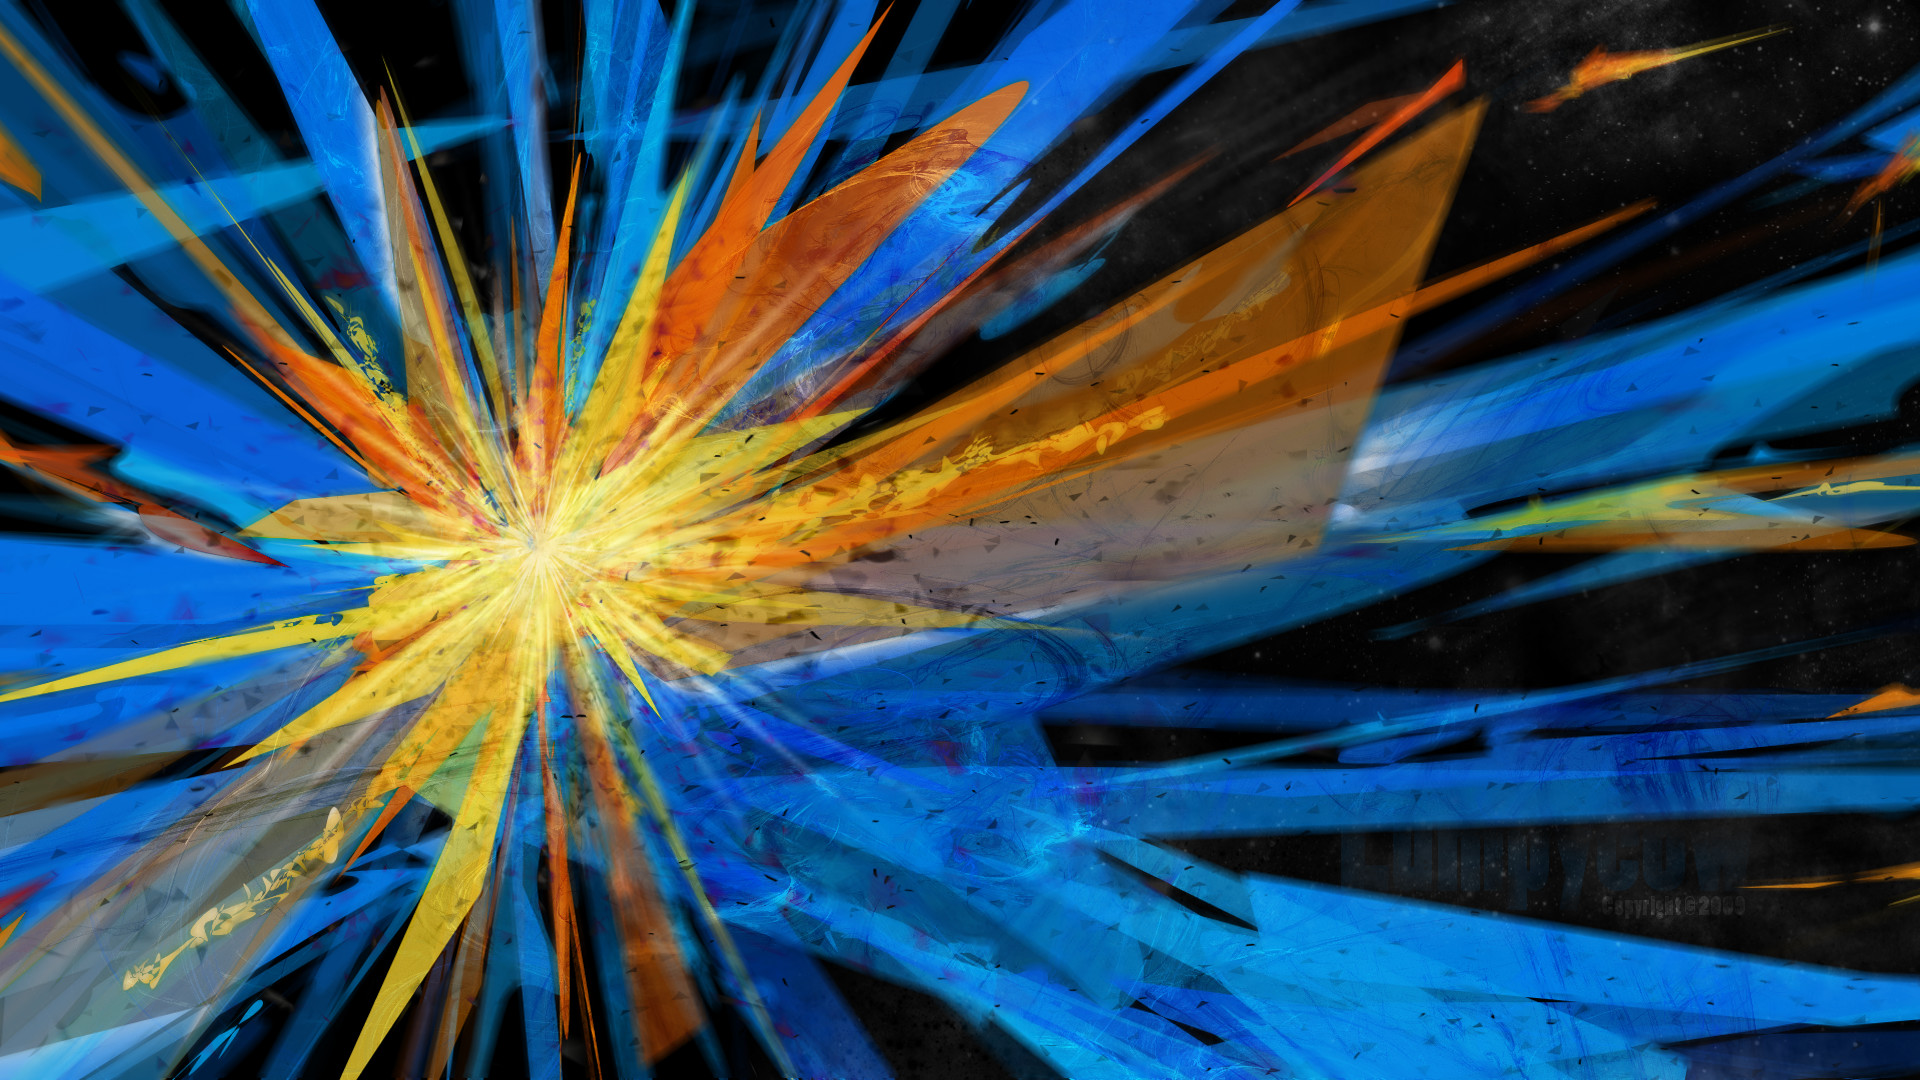 Explosion Wallpapers HD  PixelsTalkNet